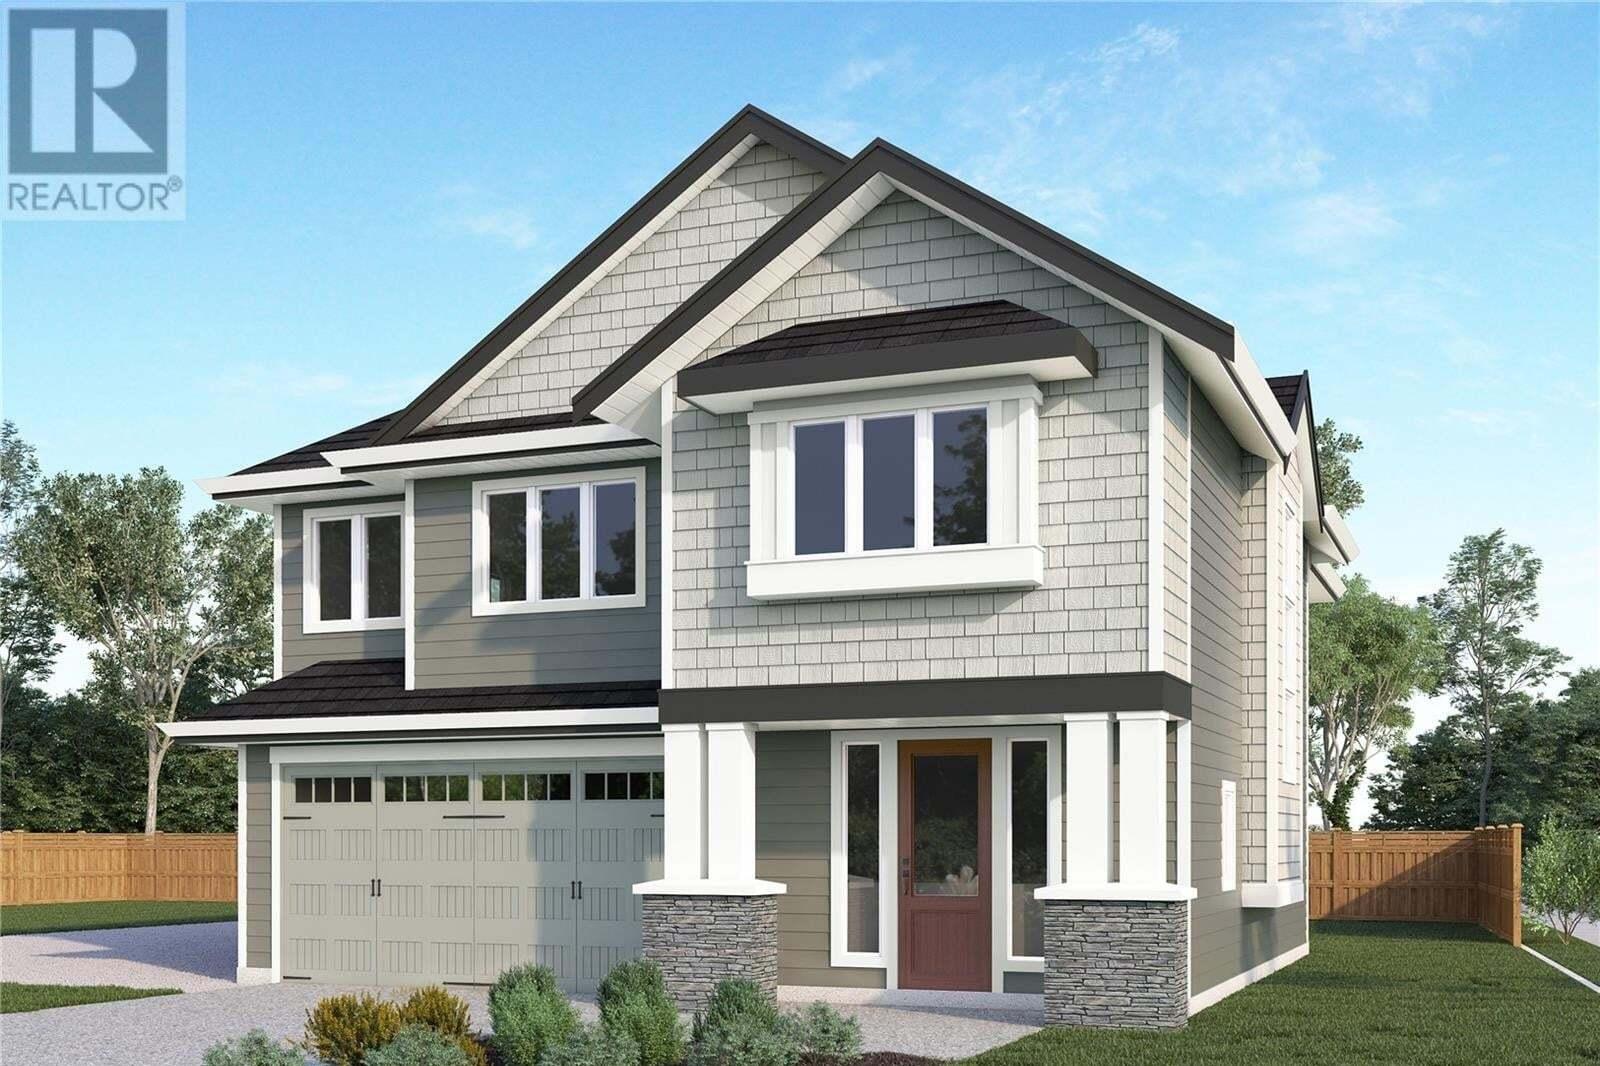 House for sale at 3593 Honeycrisp Ave Langford British Columbia - MLS: 853973